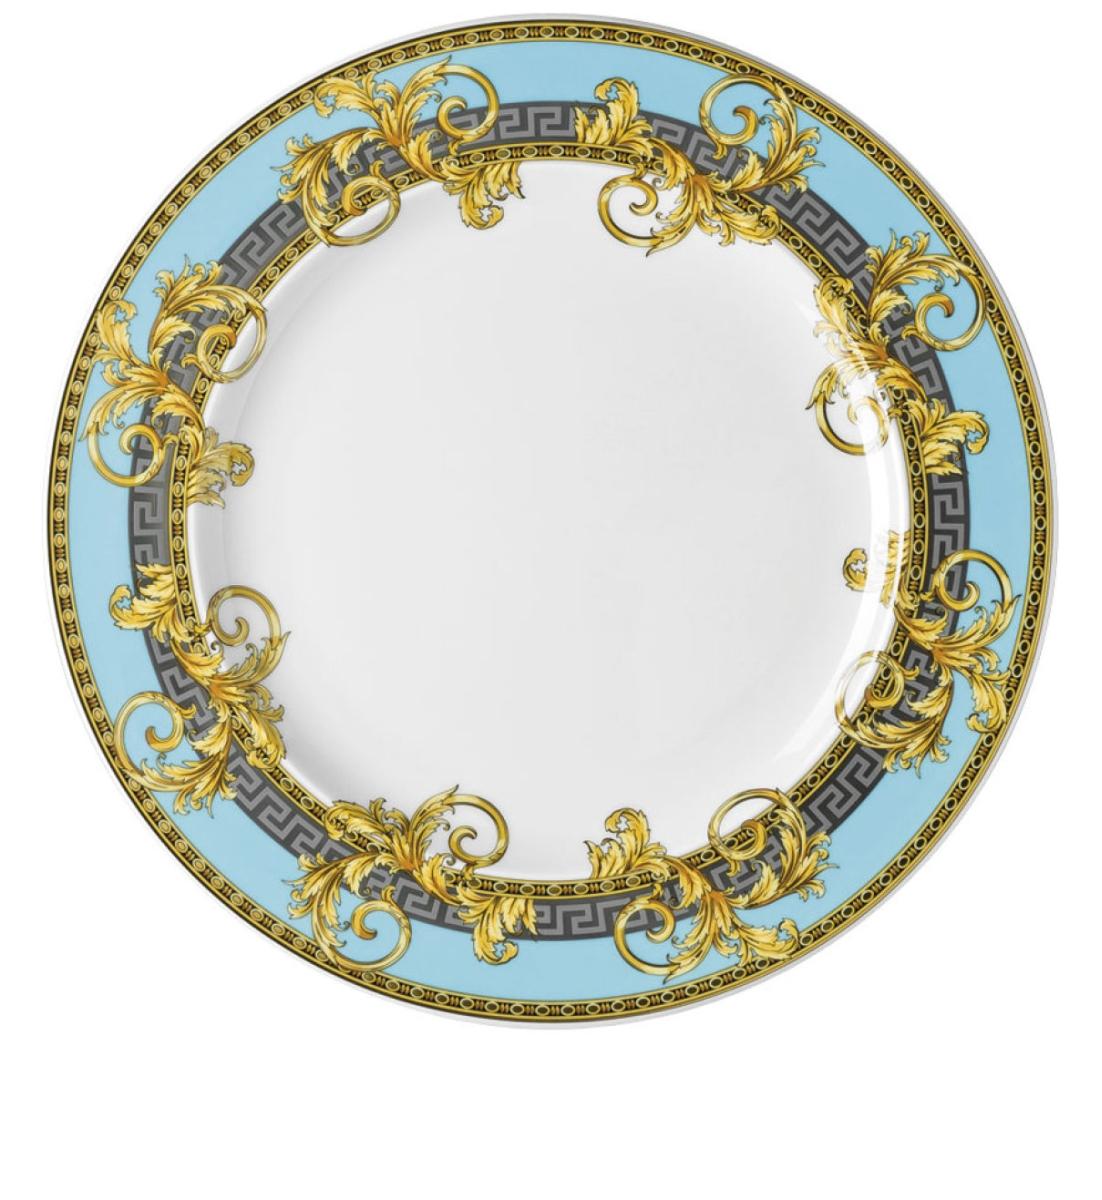 e709b3b4dbcd plate Rosenthal prestige gala le bleu plate 19325-403638-10227